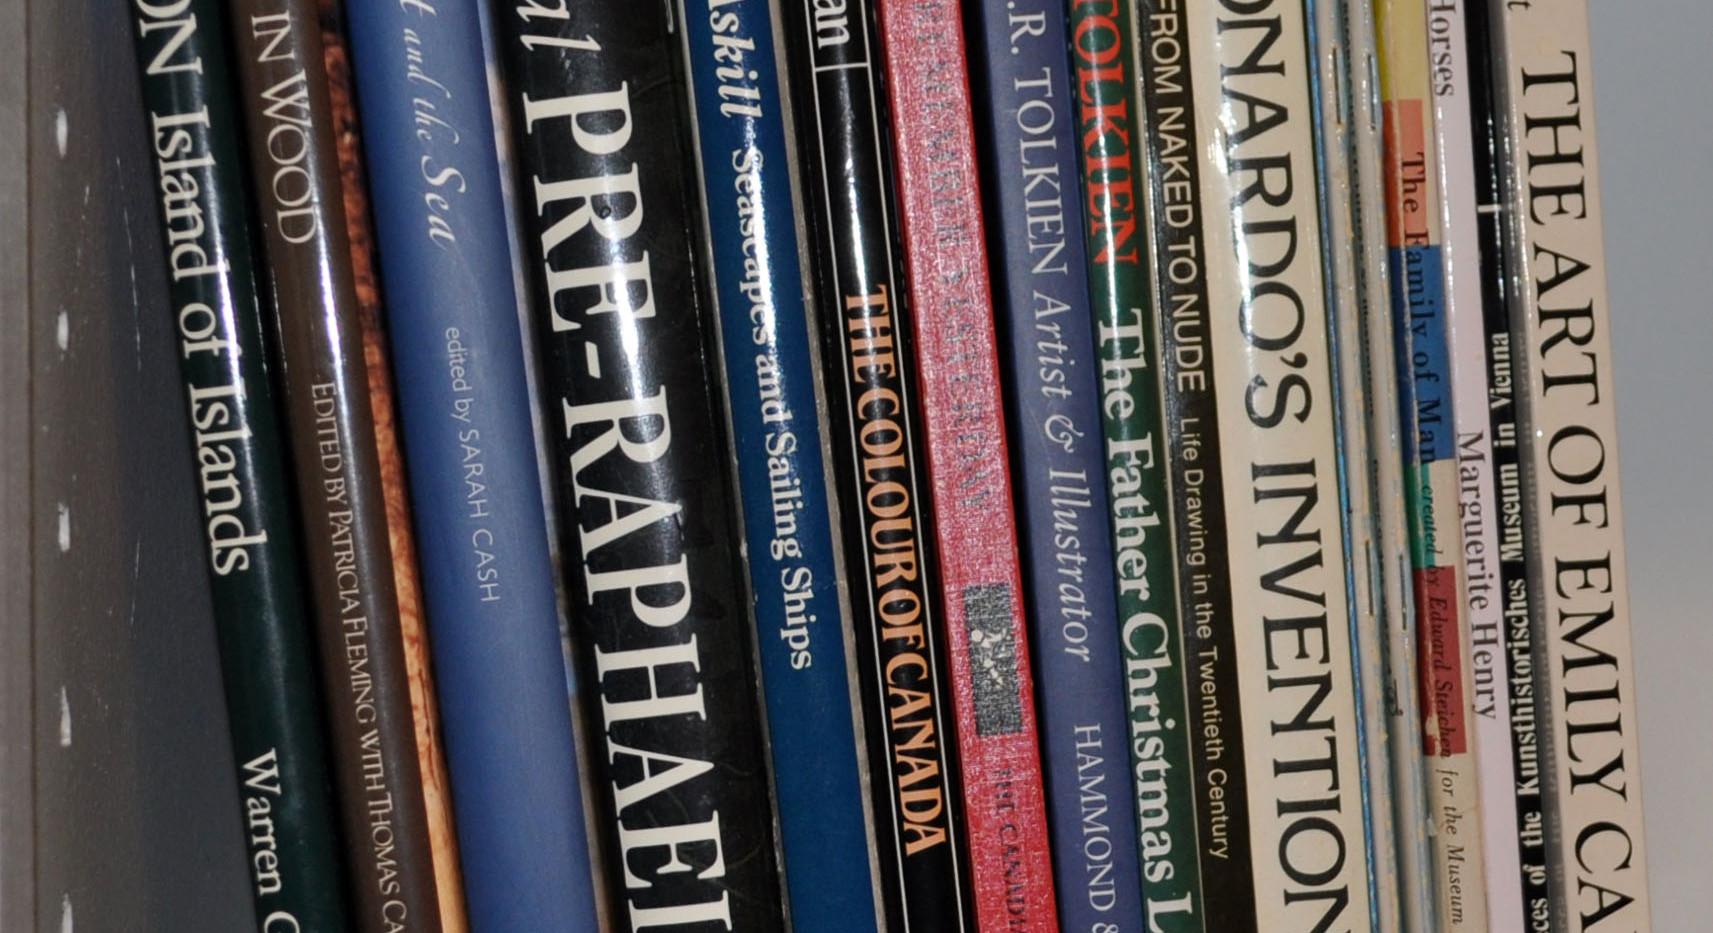 Art books 6